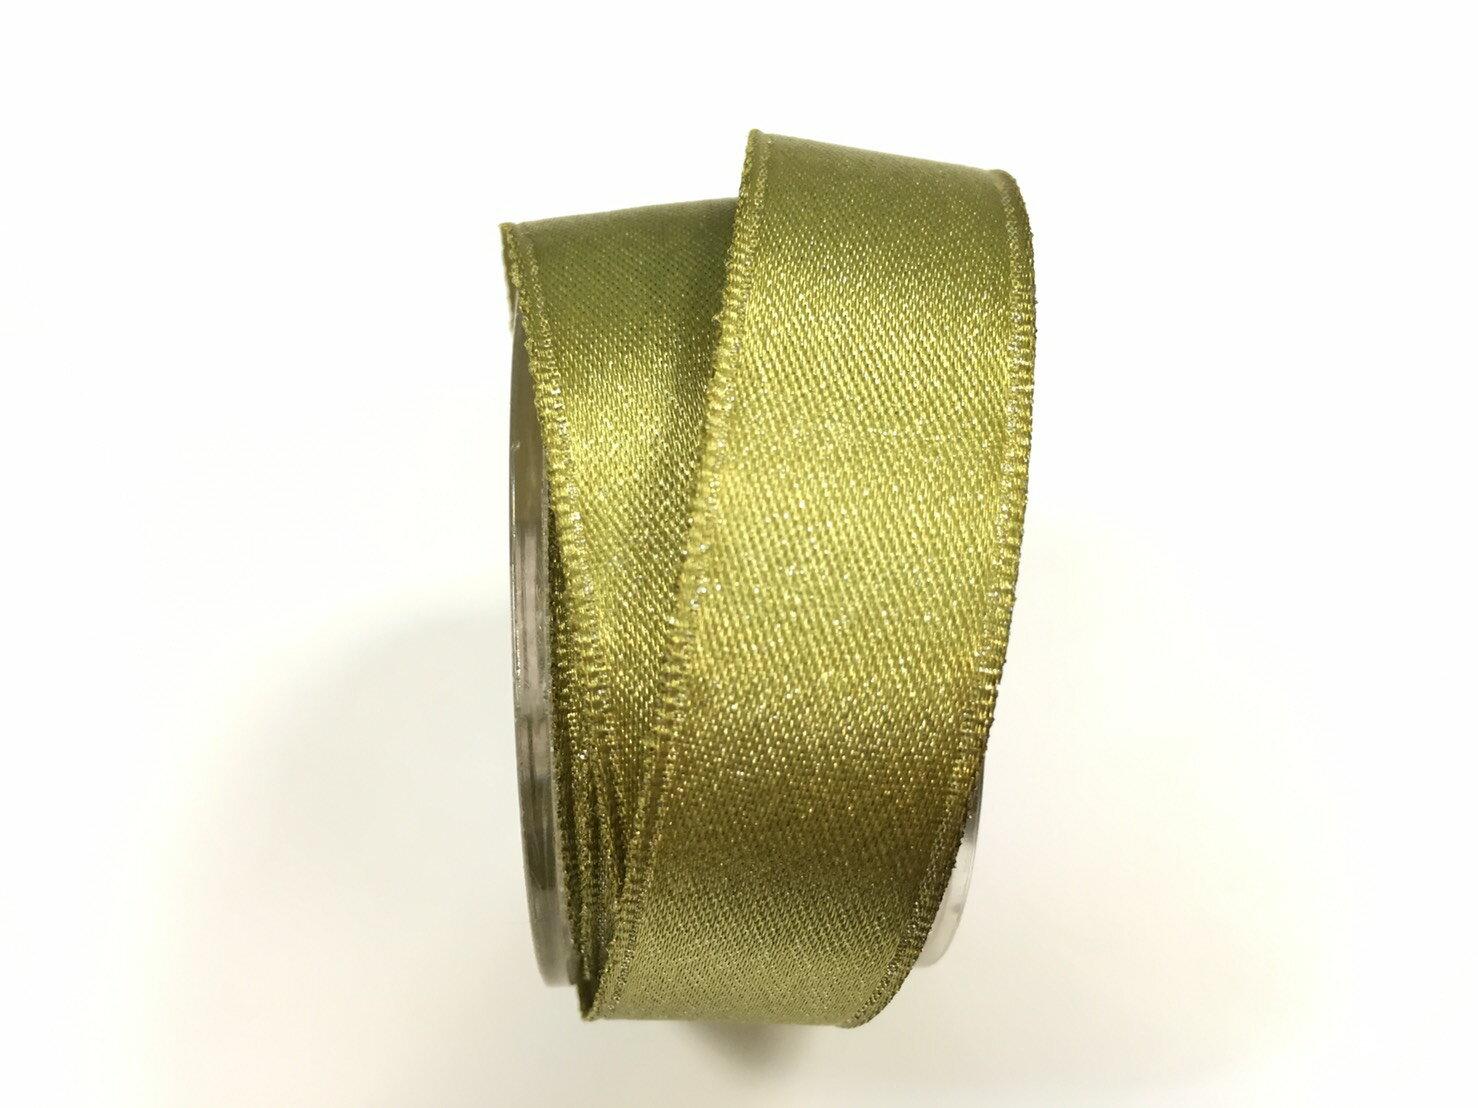 【Crystal Rose緞帶專賣店】金粉緞面鐵絲帶  3碼 (10色) 6